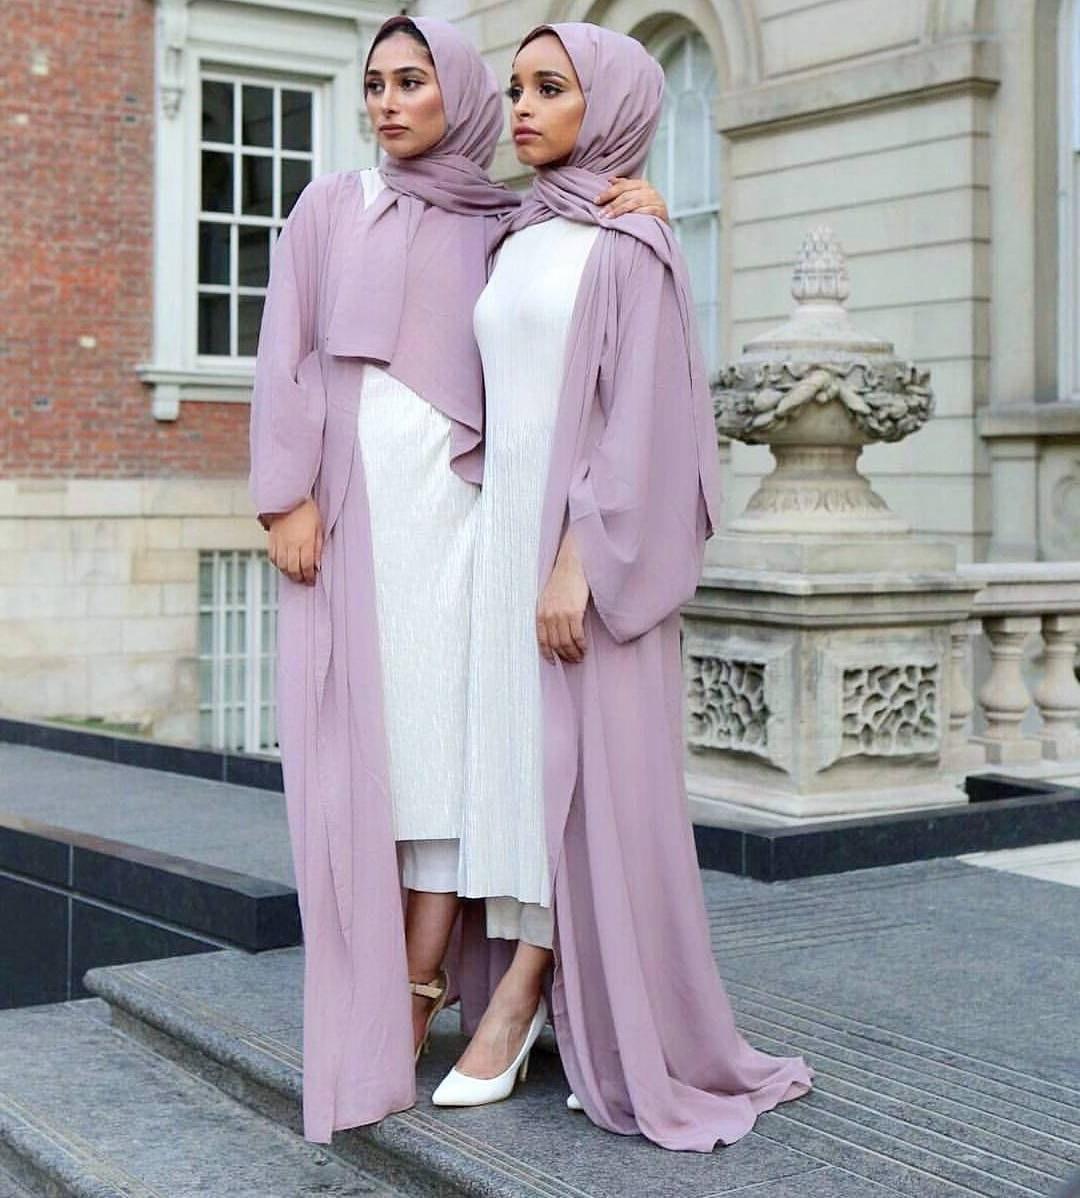 Inspirasi Model Baju Lebaran Syahrini 2017 0gdr 50 Model Baju Lebaran Terbaru 2018 Modern & Elegan